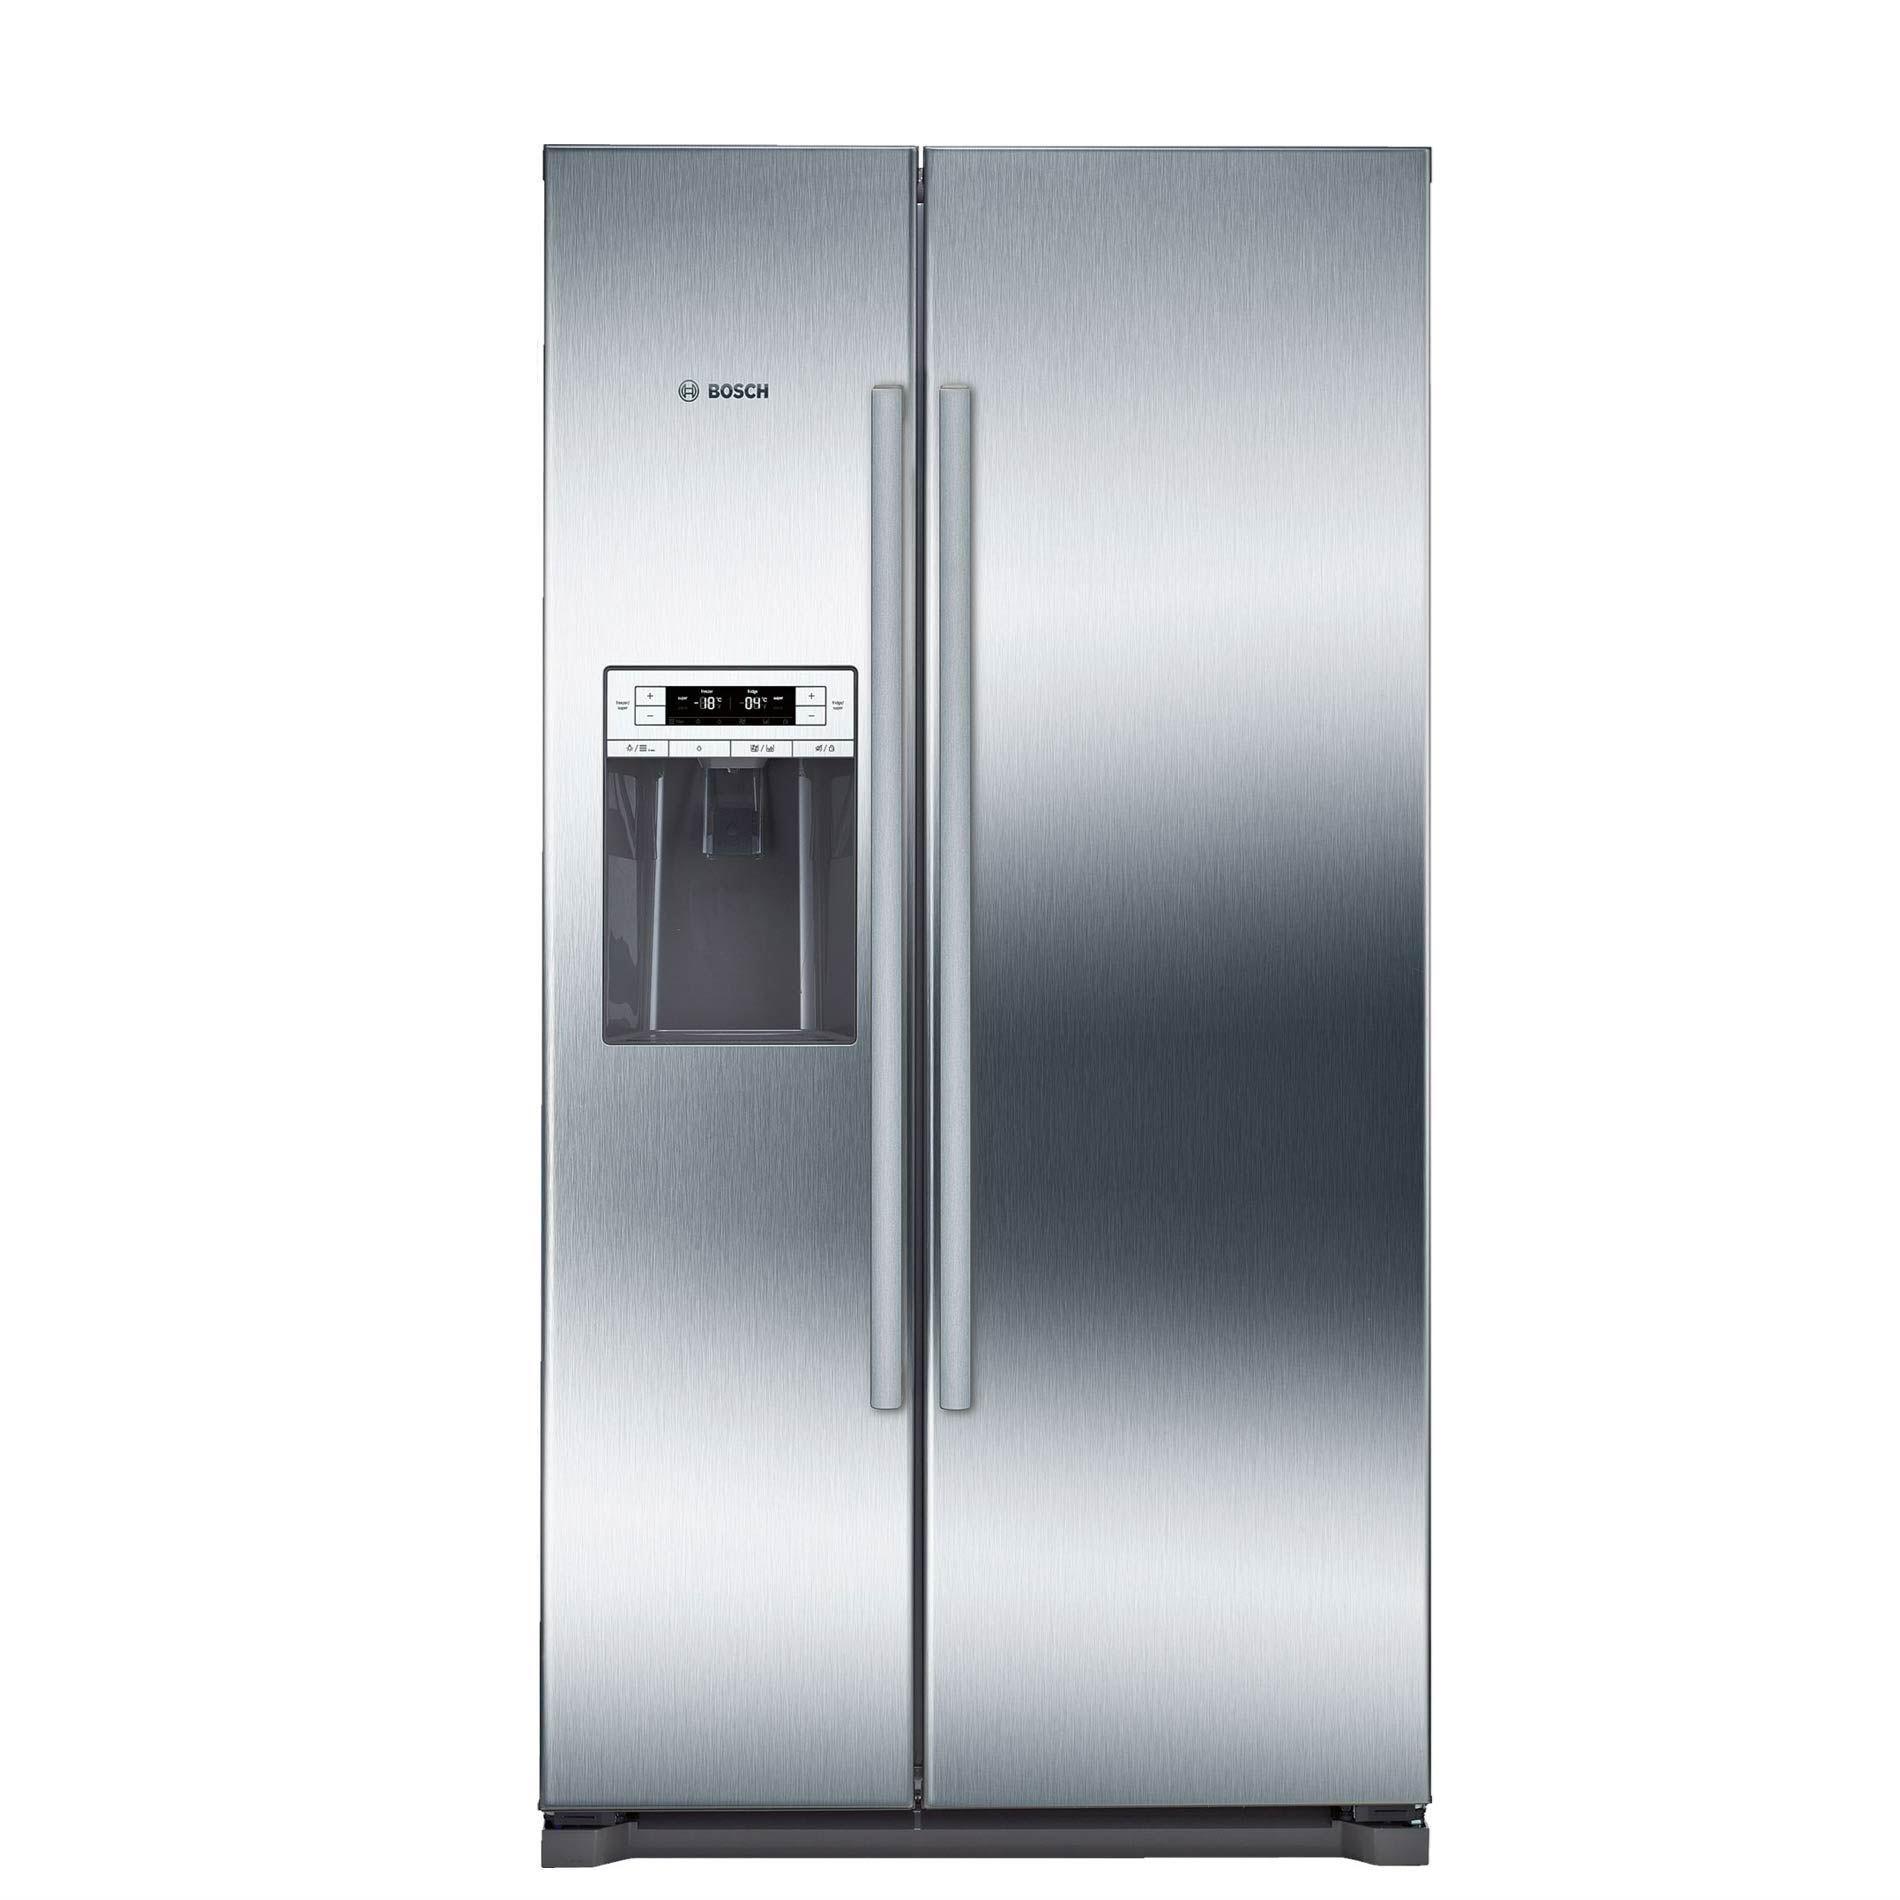 Picture of KAD90VI20G American Style Fridge Freezer